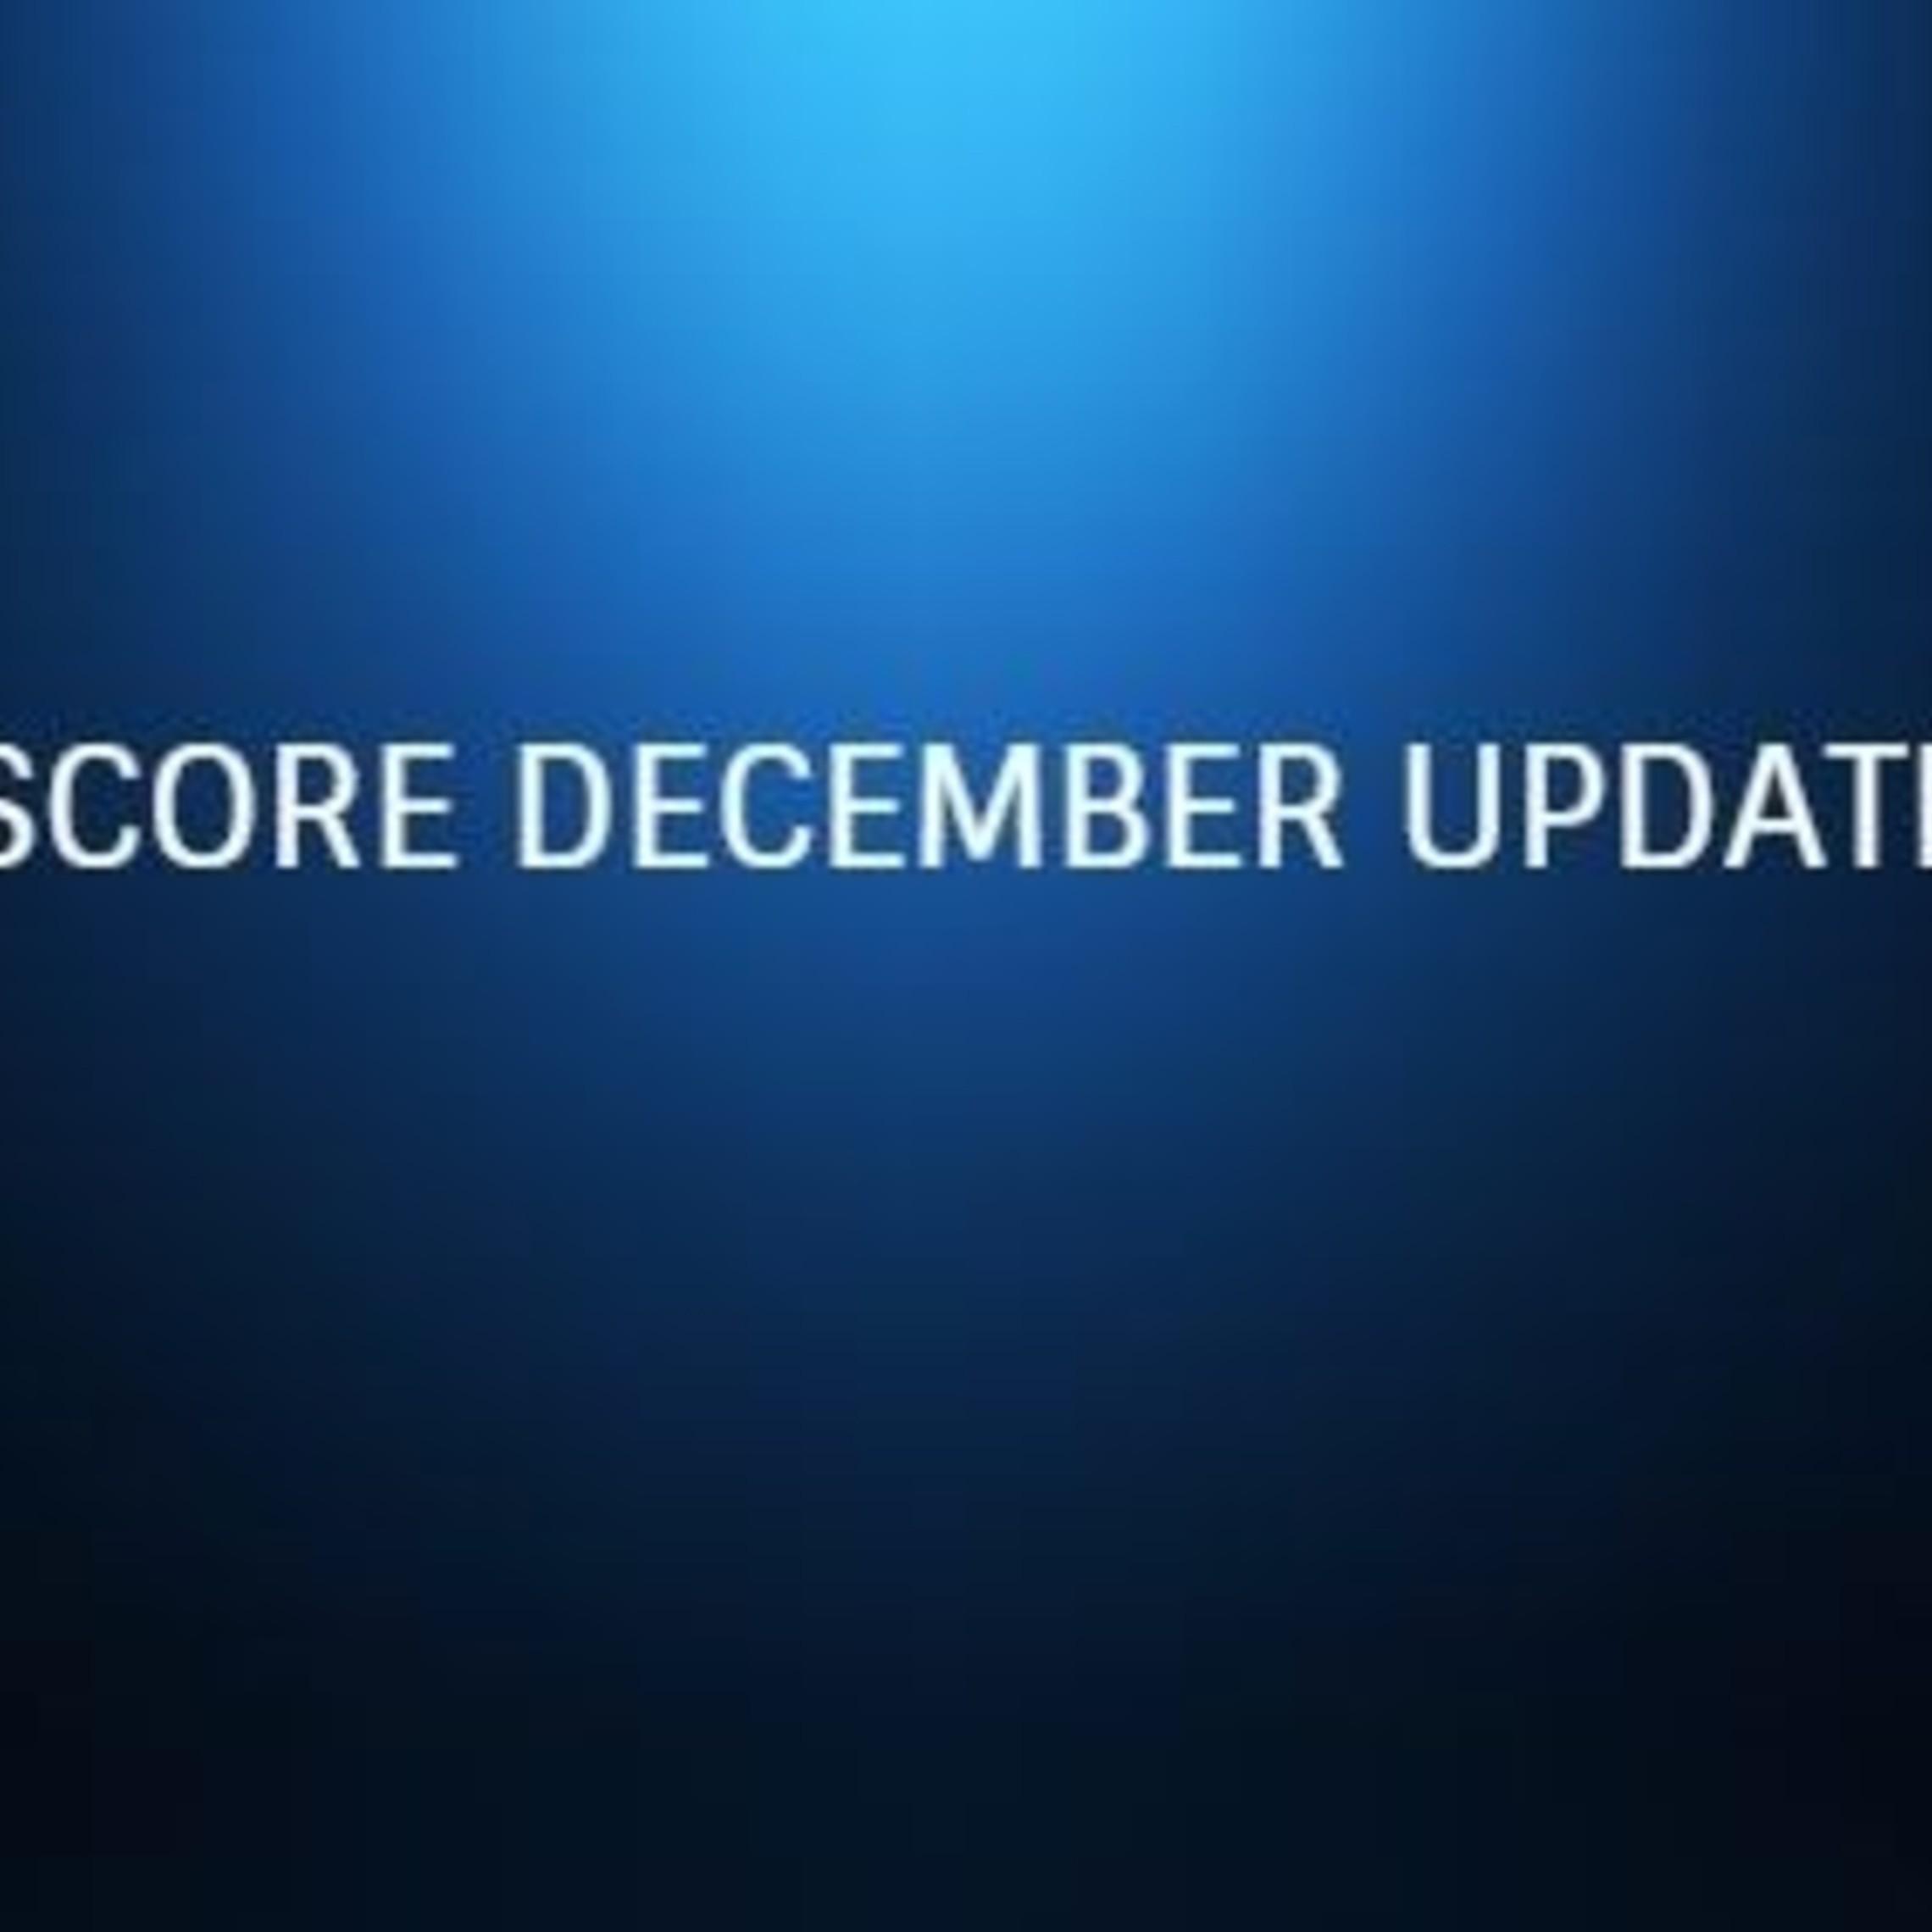 Score December Update